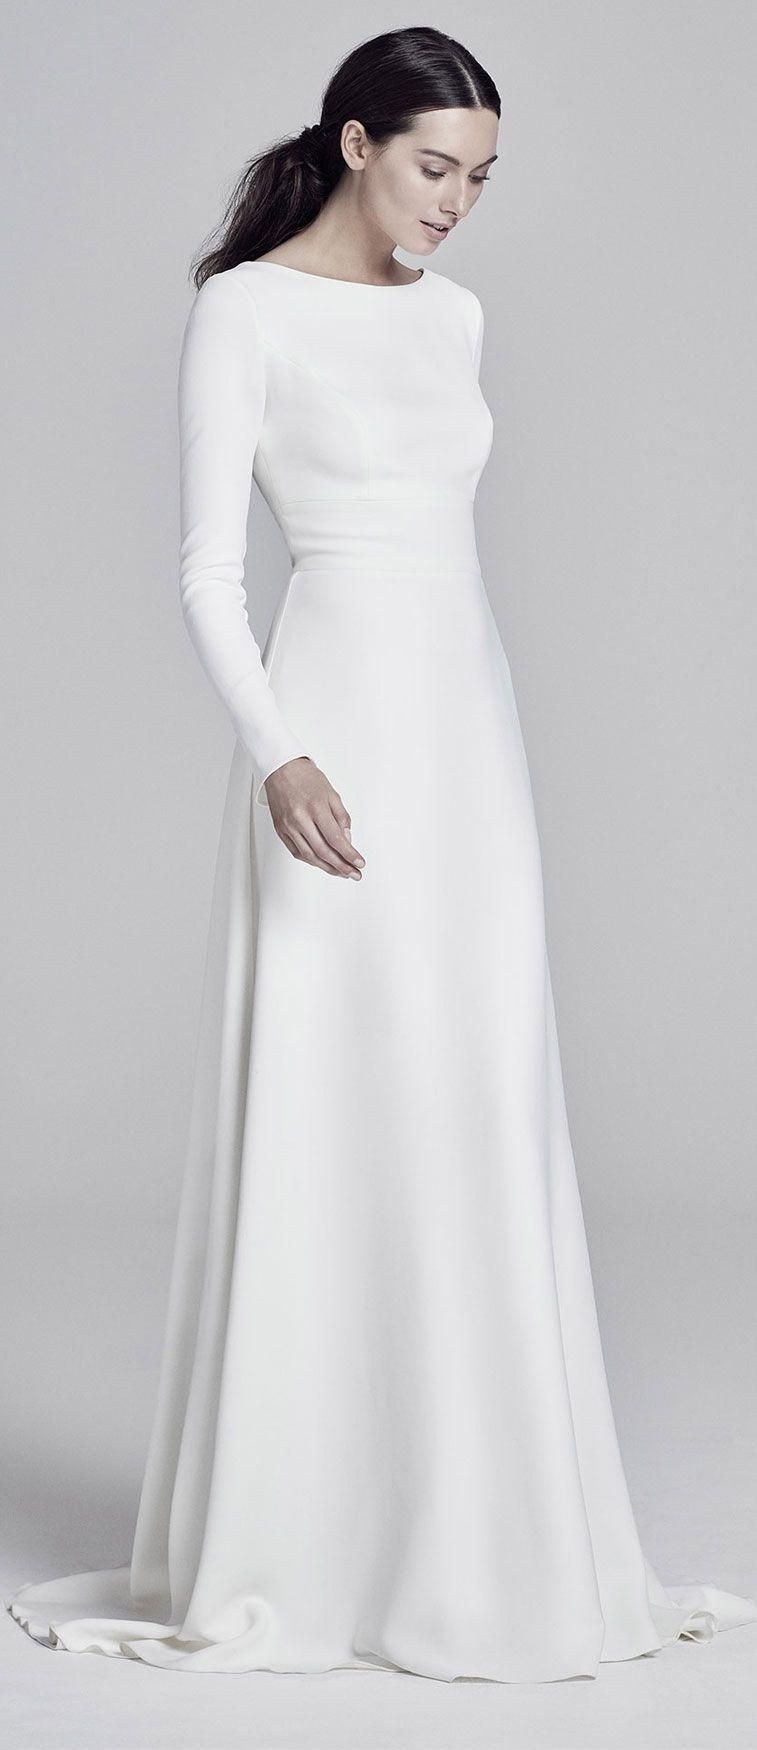 32 Sleek Chic And Cosmopolitan Wedding Dresses Fab Wedding Dress Wedding Dresses Bri Modern Wedding Dress Long Sleeve Bridal Dresses Chic Wedding Dresses [ 1750 x 757 Pixel ]